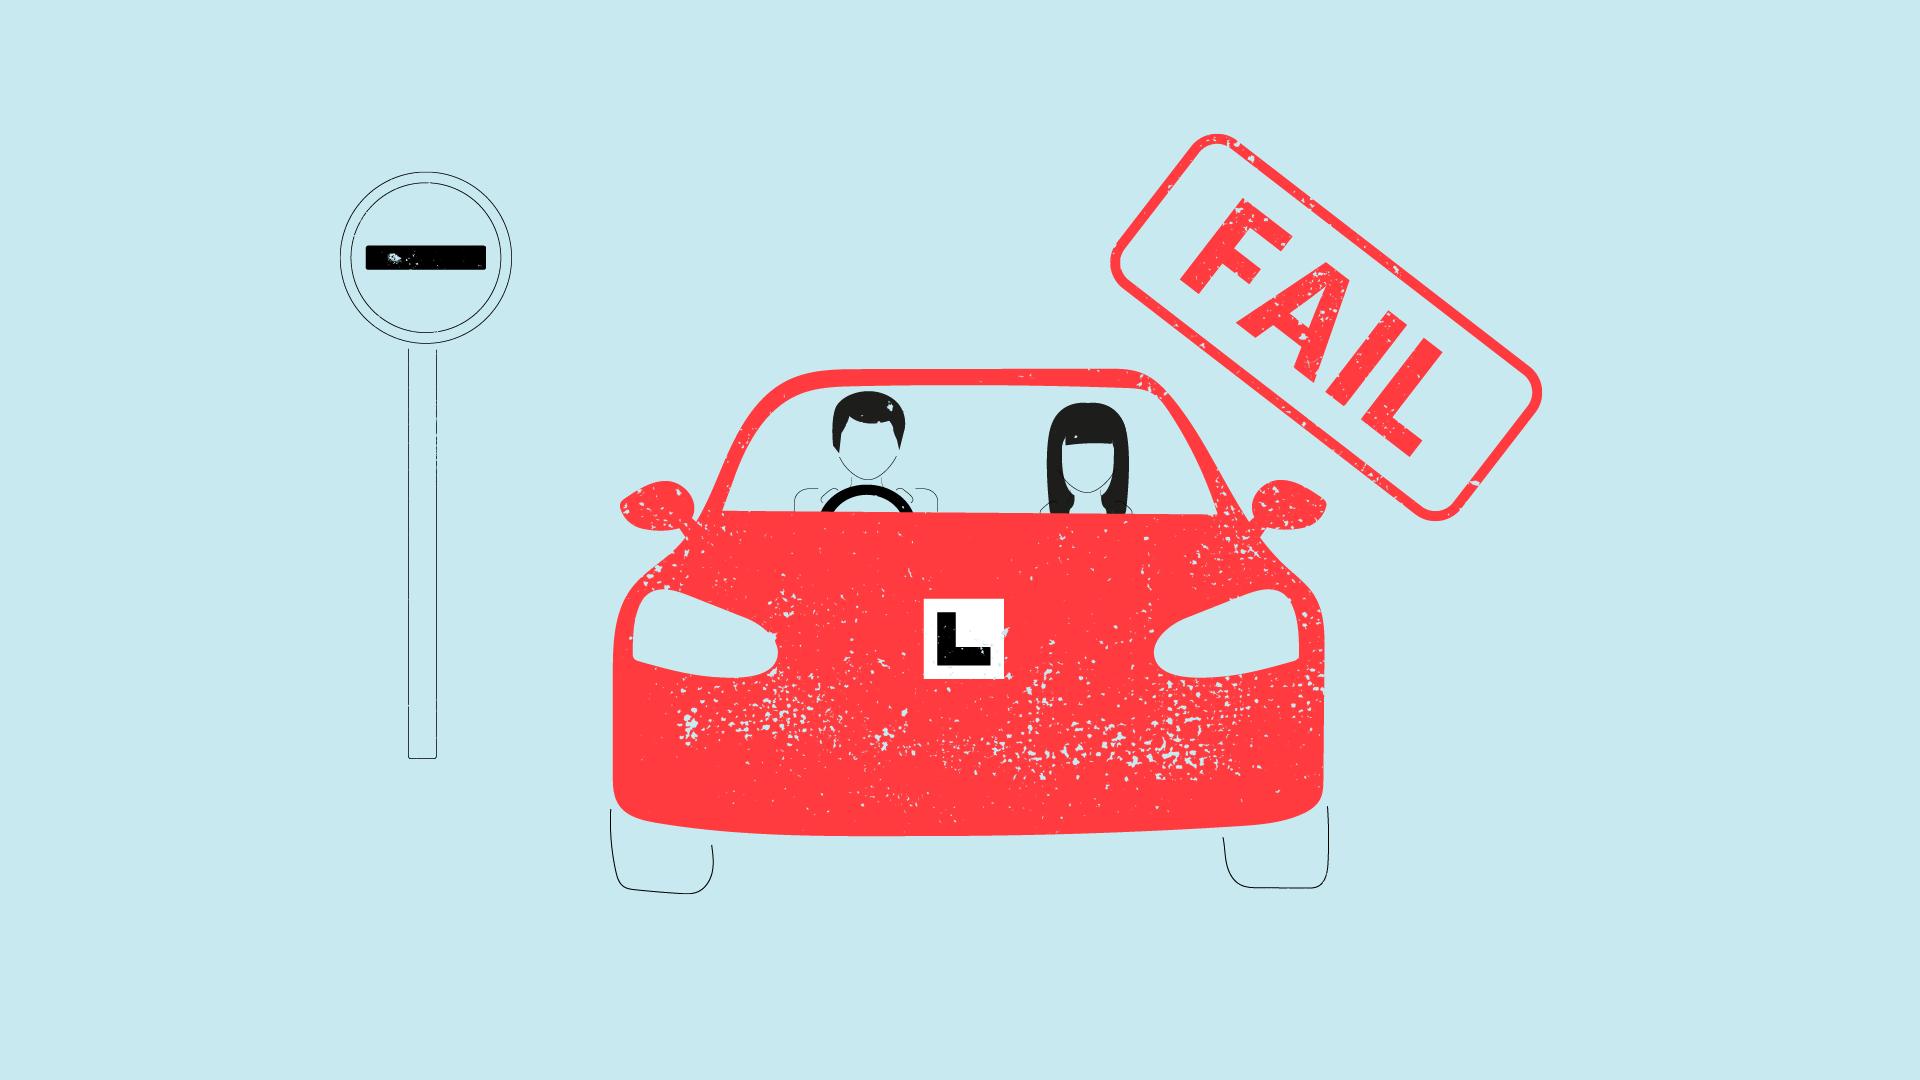 Illustration for driving test faults blog